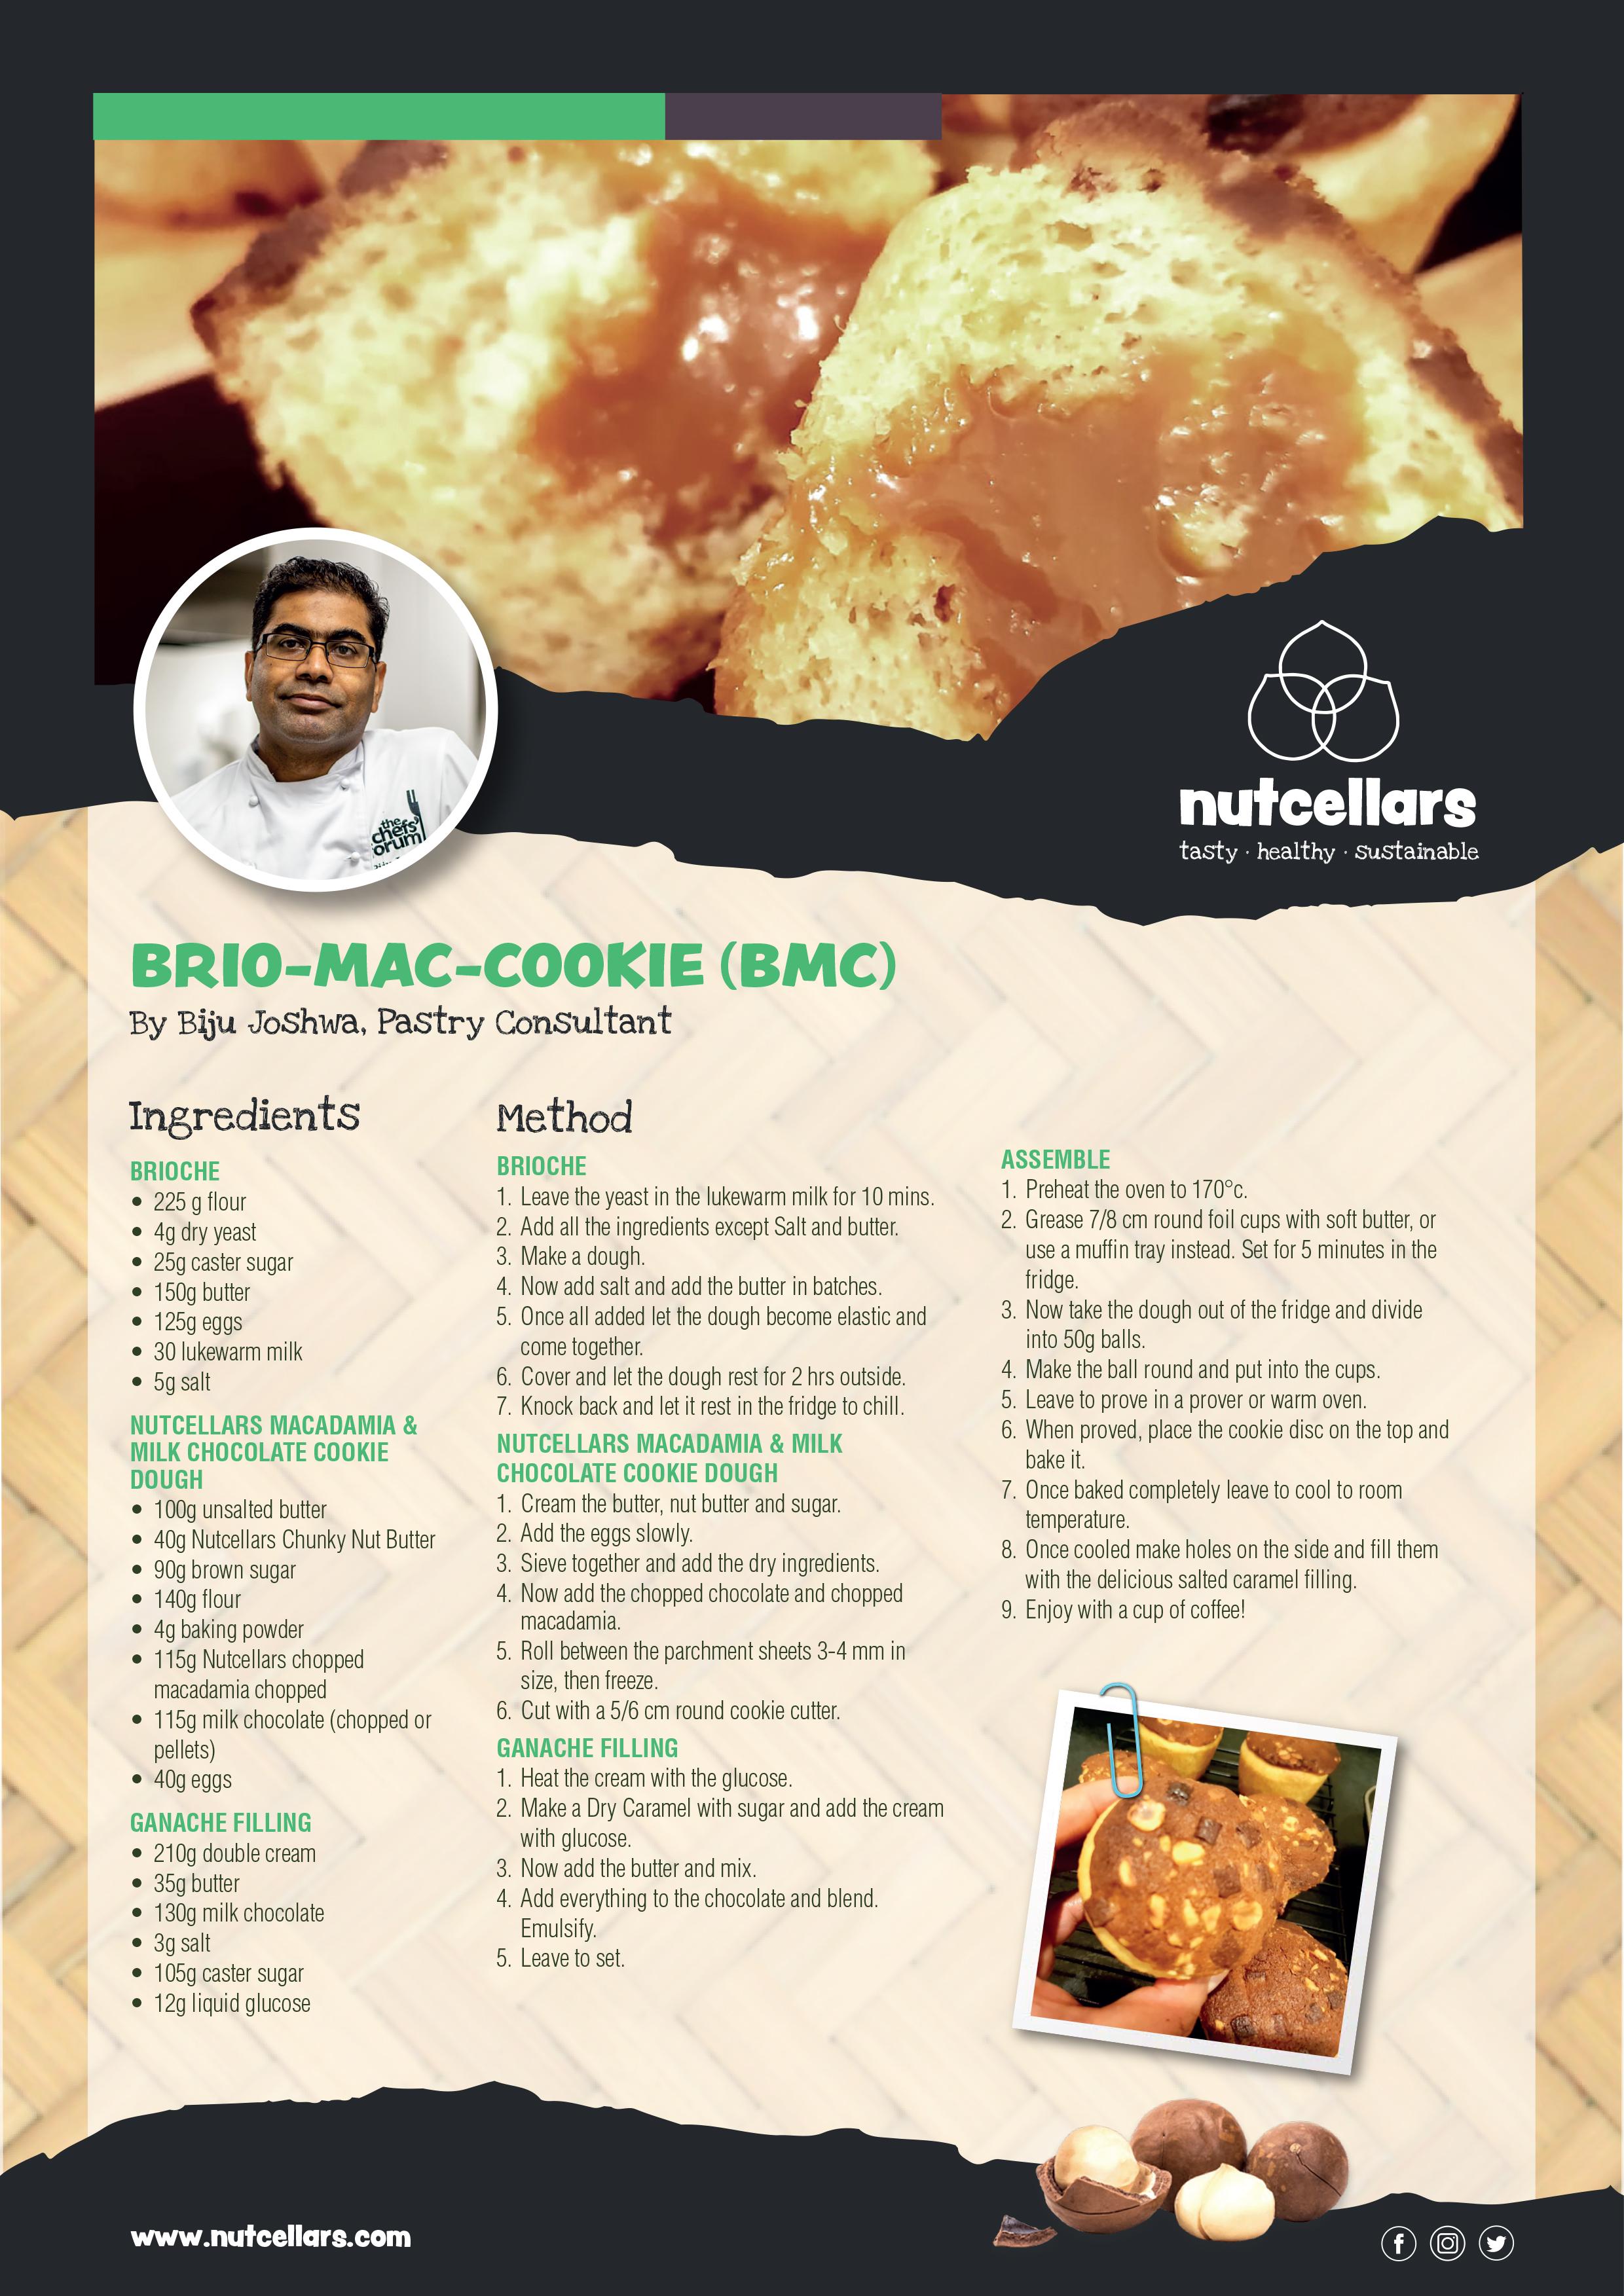 bijou joshwa recipe